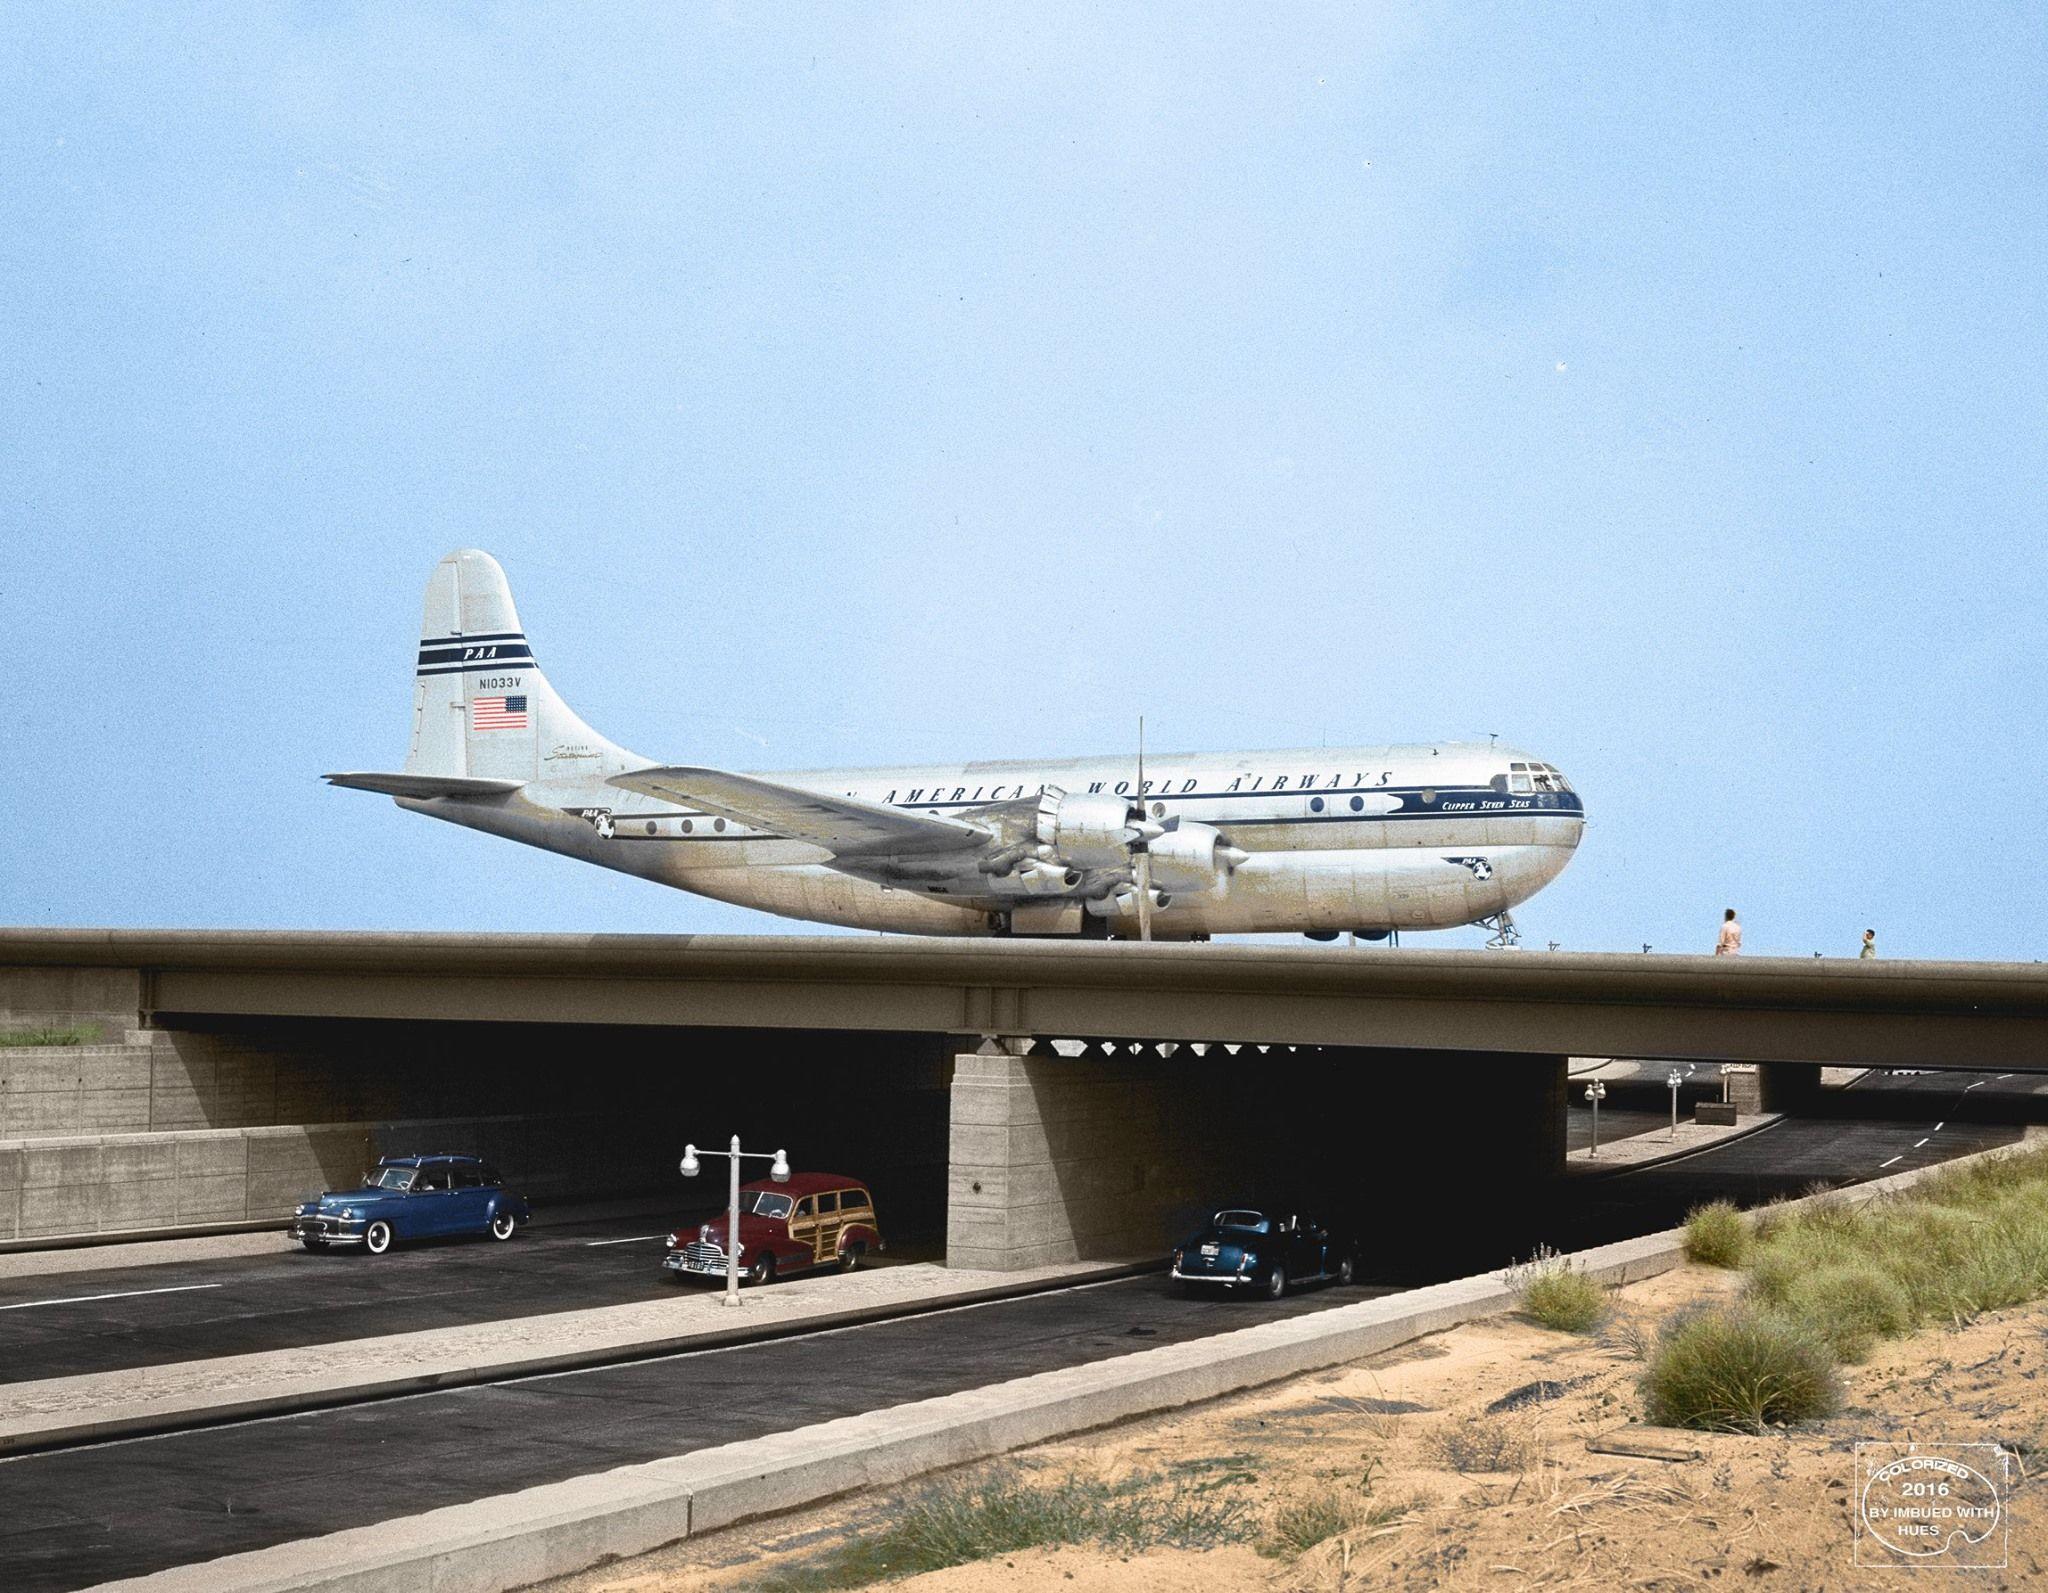 Boeing 377 Stratocruiser at JFK Airport, 1949 Boeing